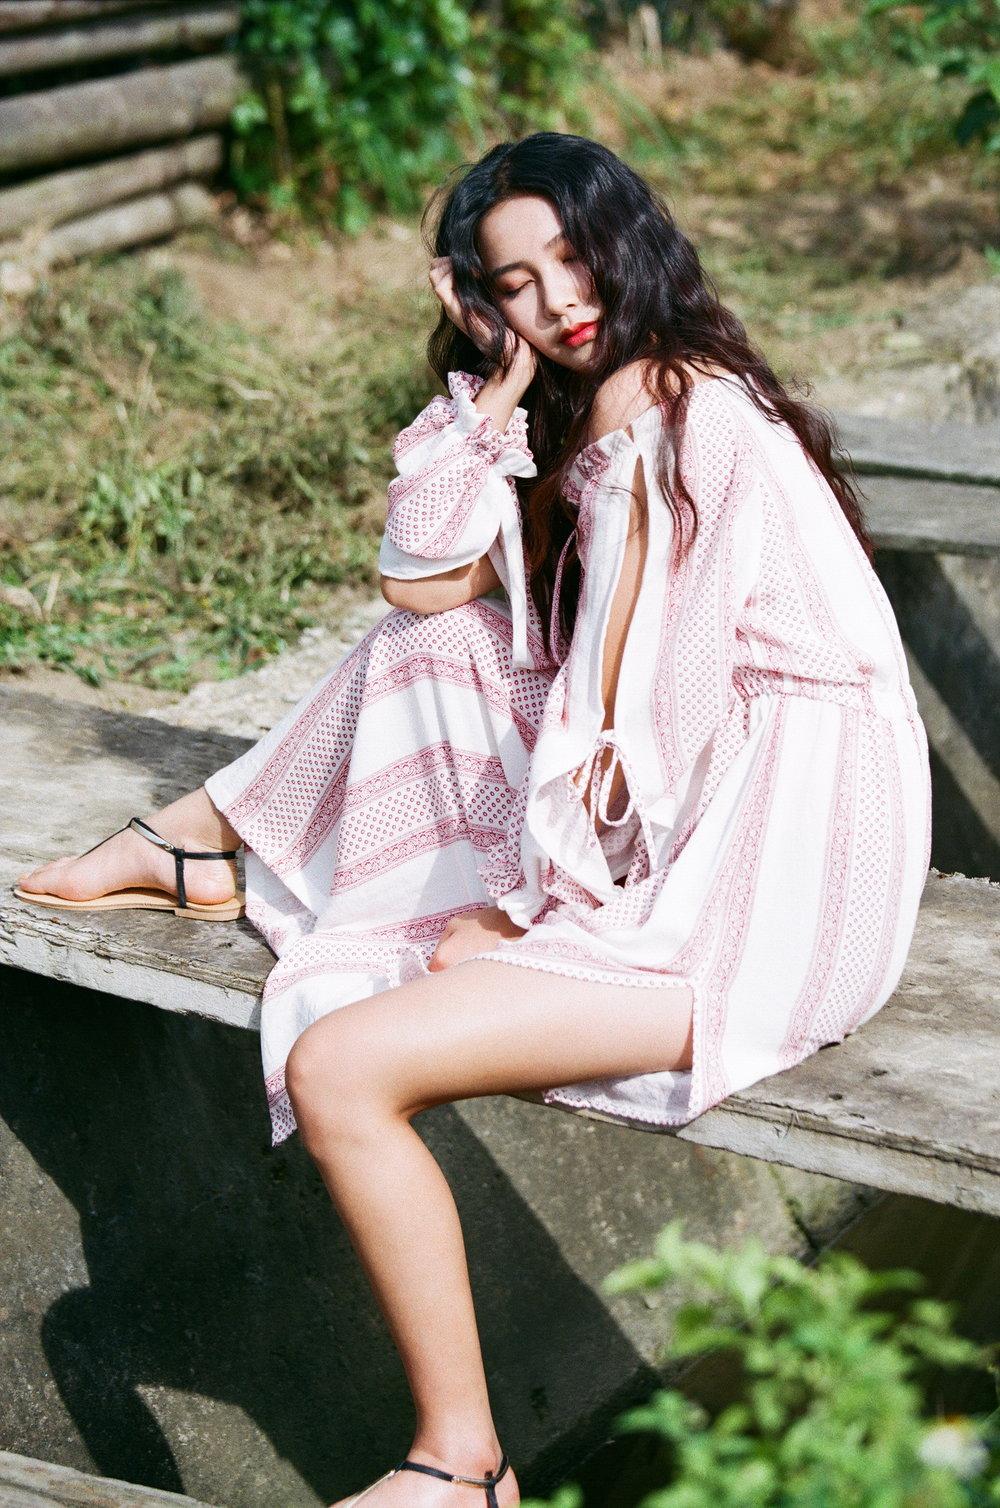 portrait-jane-girl-寫真-許厝港-桃園-04.jpg